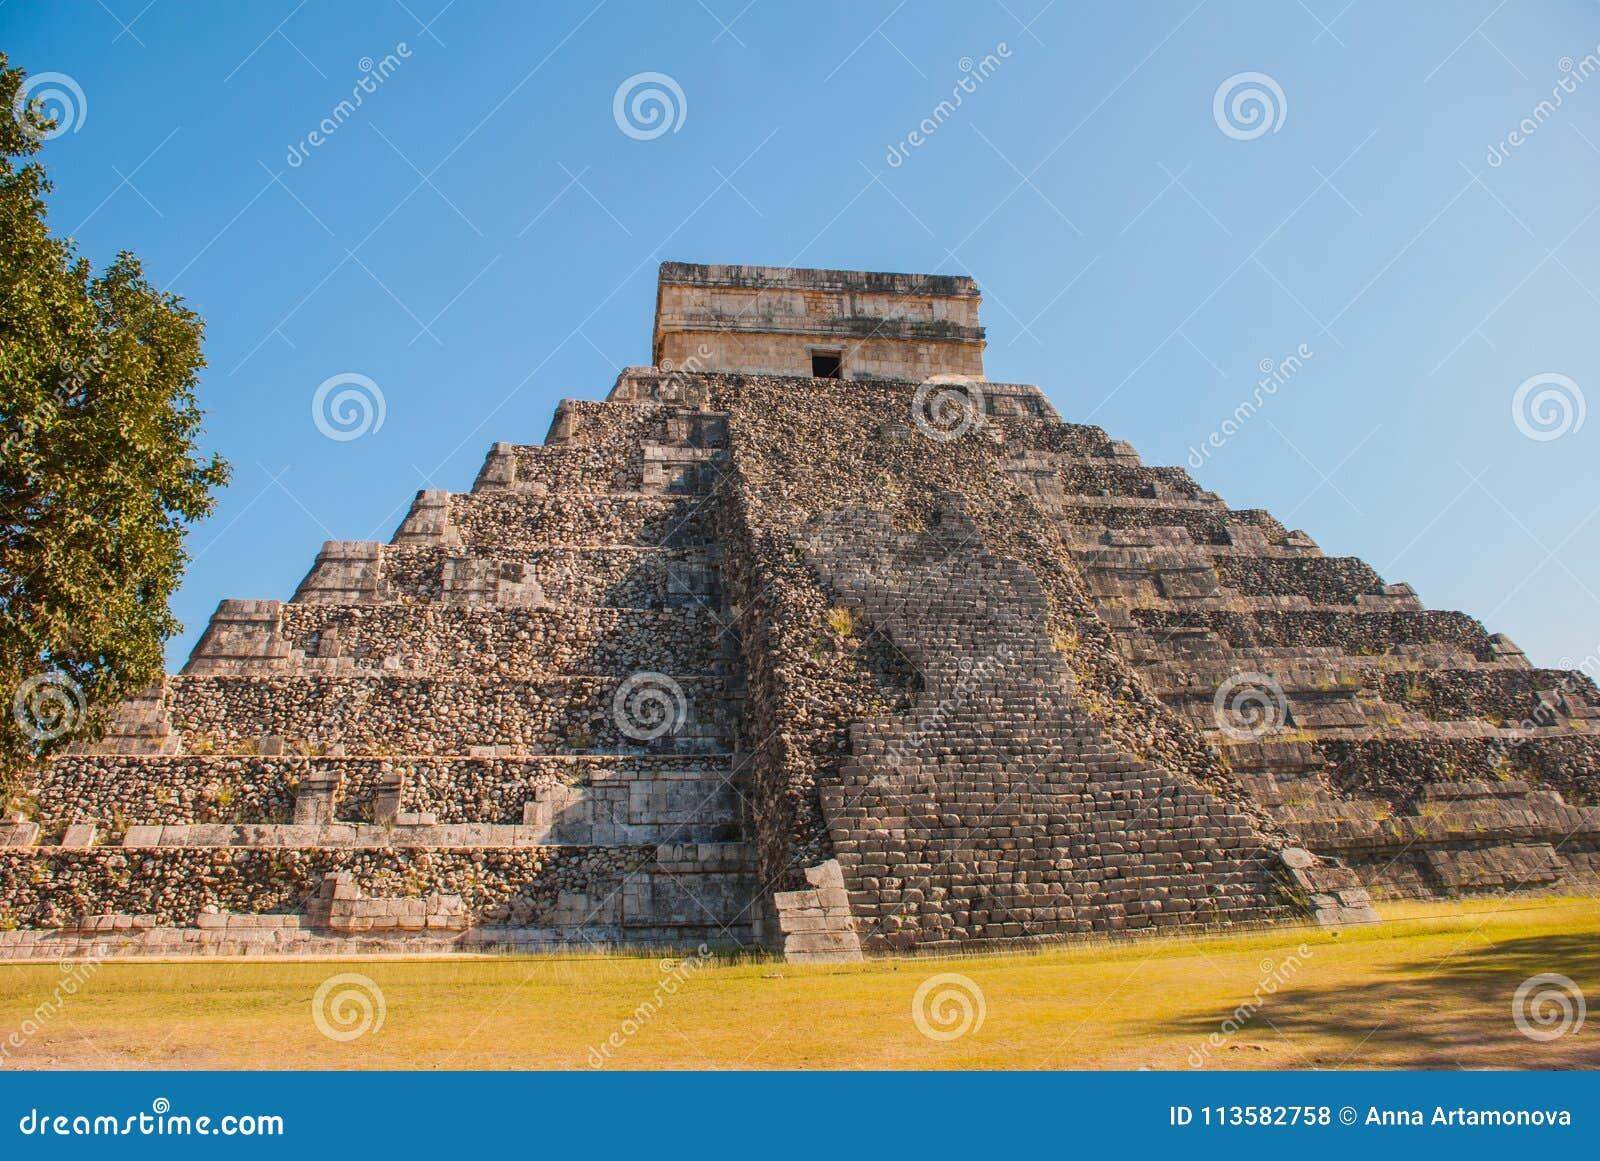 Anicent玛雅人玛雅金字塔El卡斯蒂略Kukulkan在奇琴伊察,墨西哥